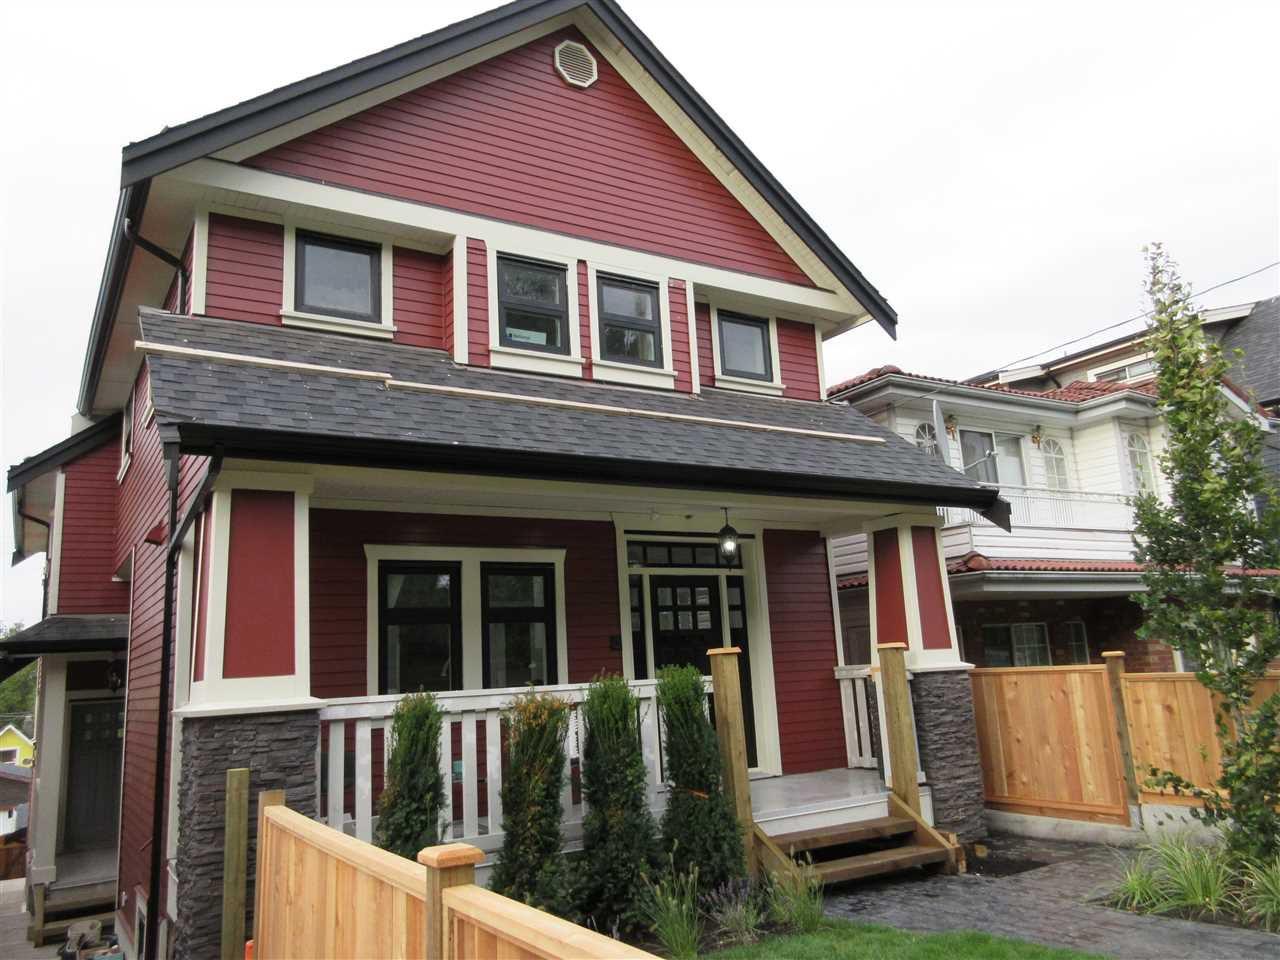 Main Photo: 1645 E 14TH AVENUE in : Grandview VE House 1/2 Duplex for sale : MLS®# R2126747